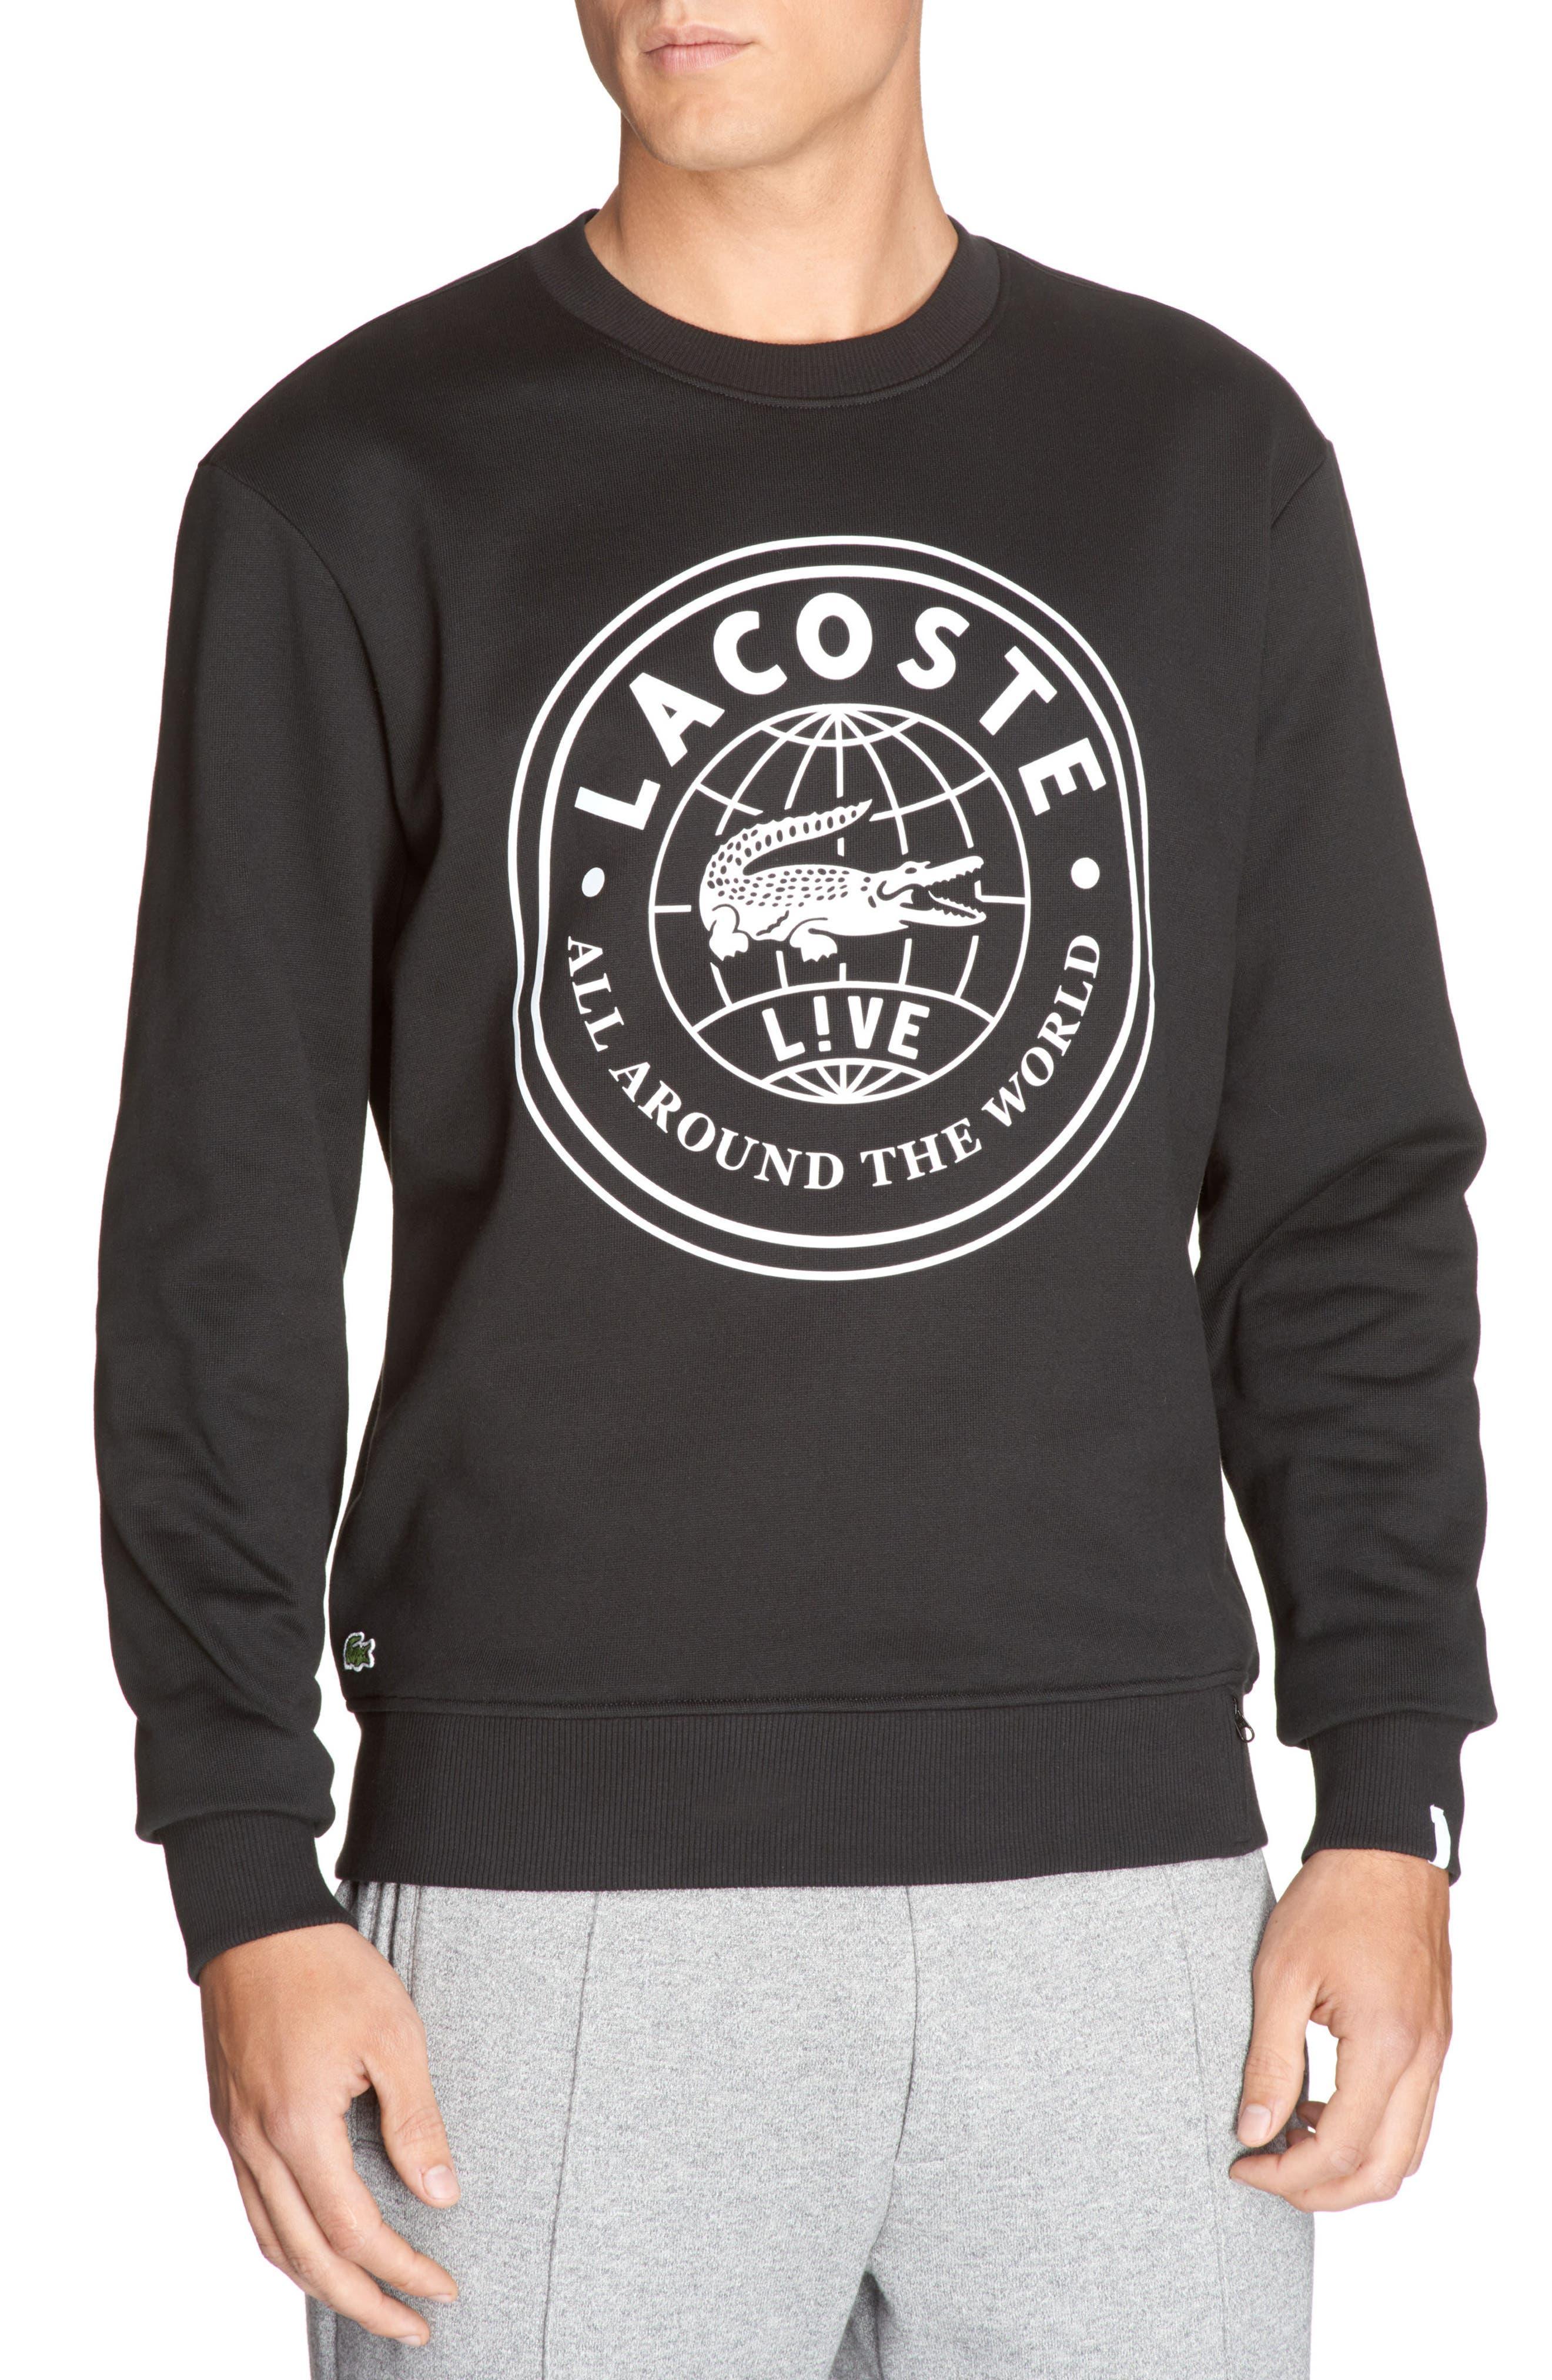 Molleton Worldwide Sweatshirt,                         Main,                         color, 003